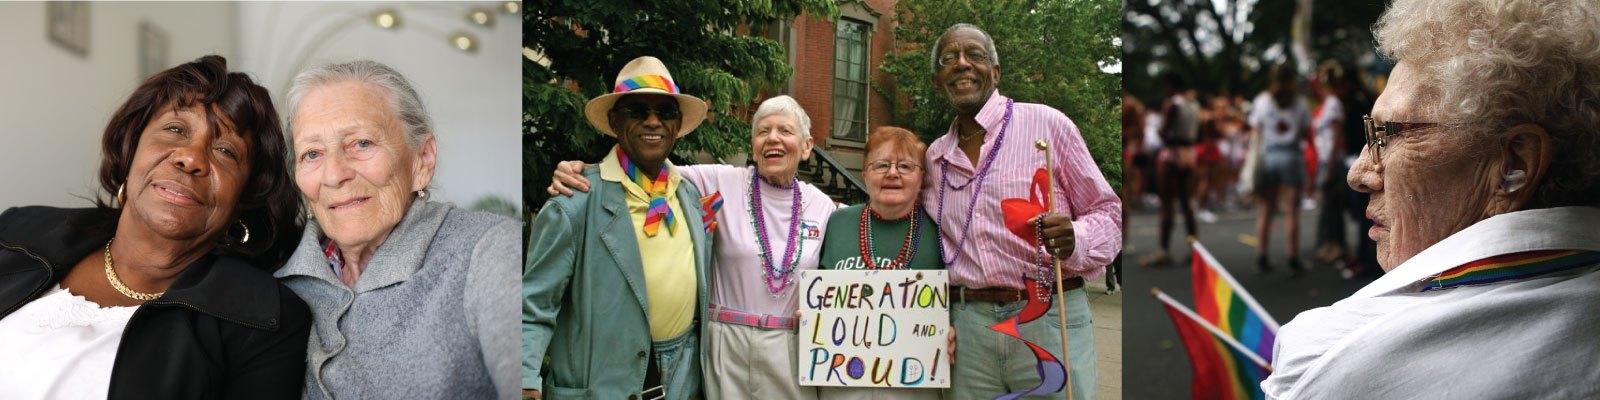 Aging Gays